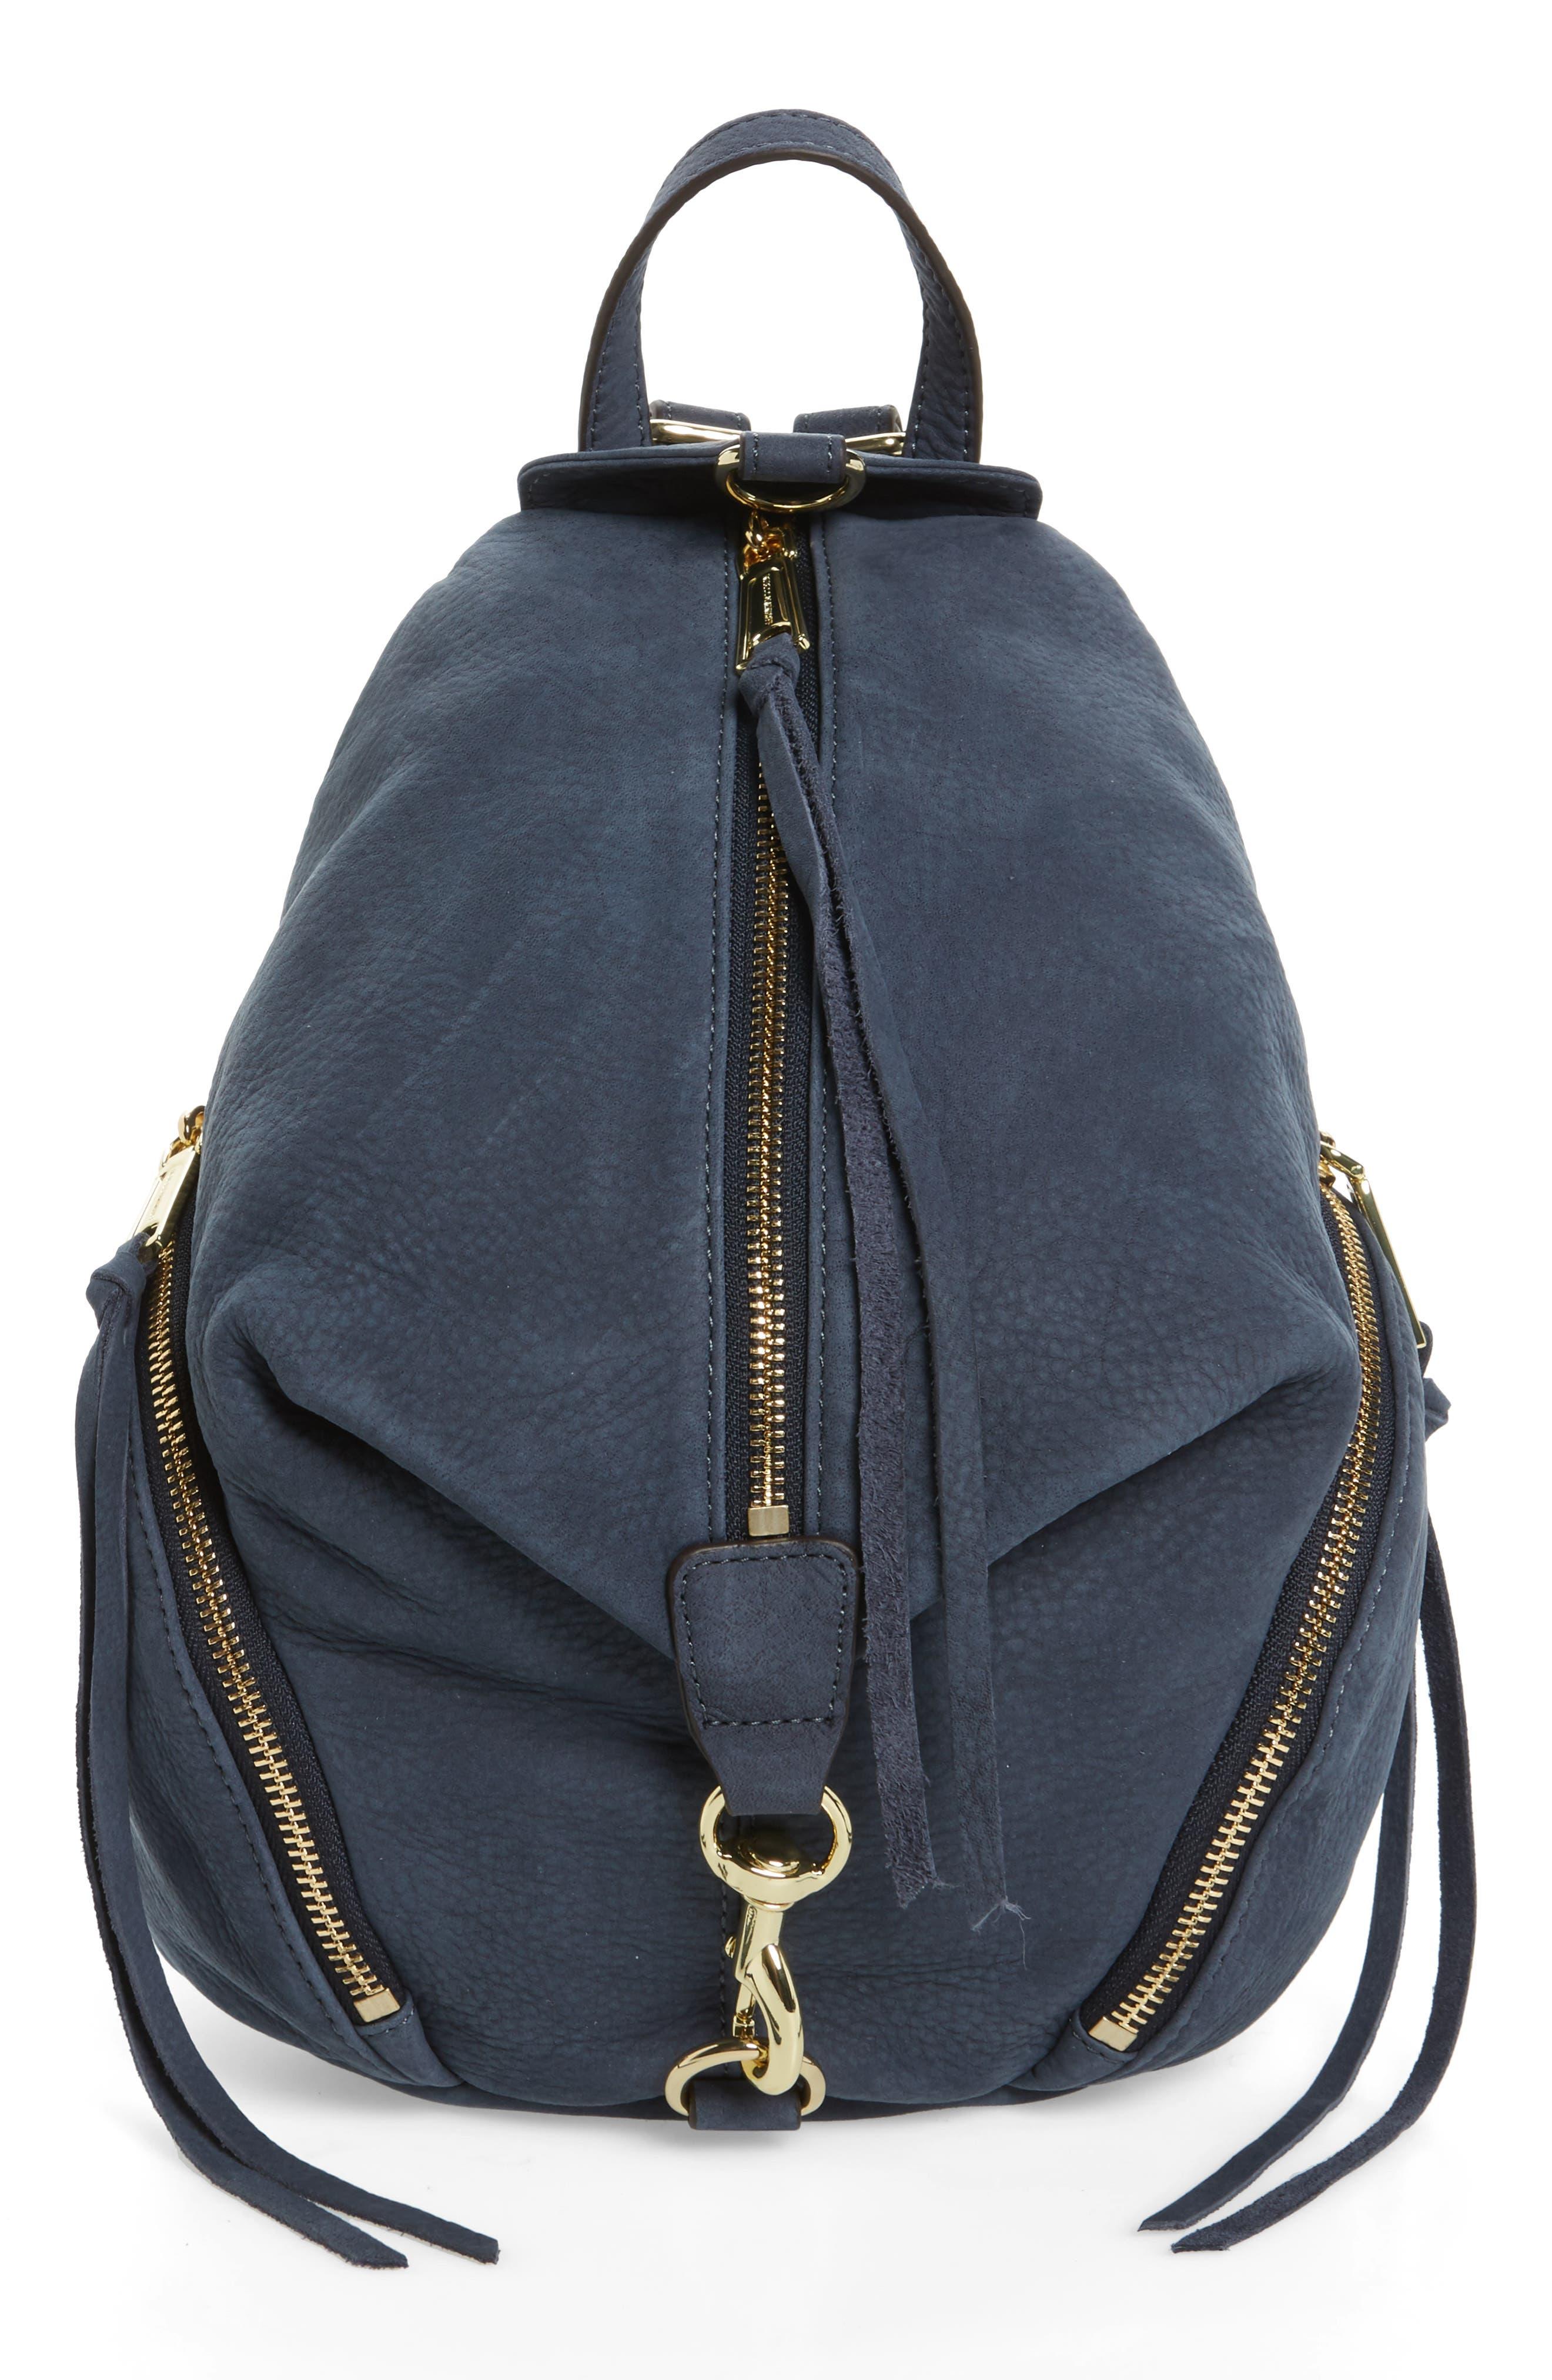 Rebecca Minkoff Handbags, Purses, Clothing & Shoes | Nordstrom